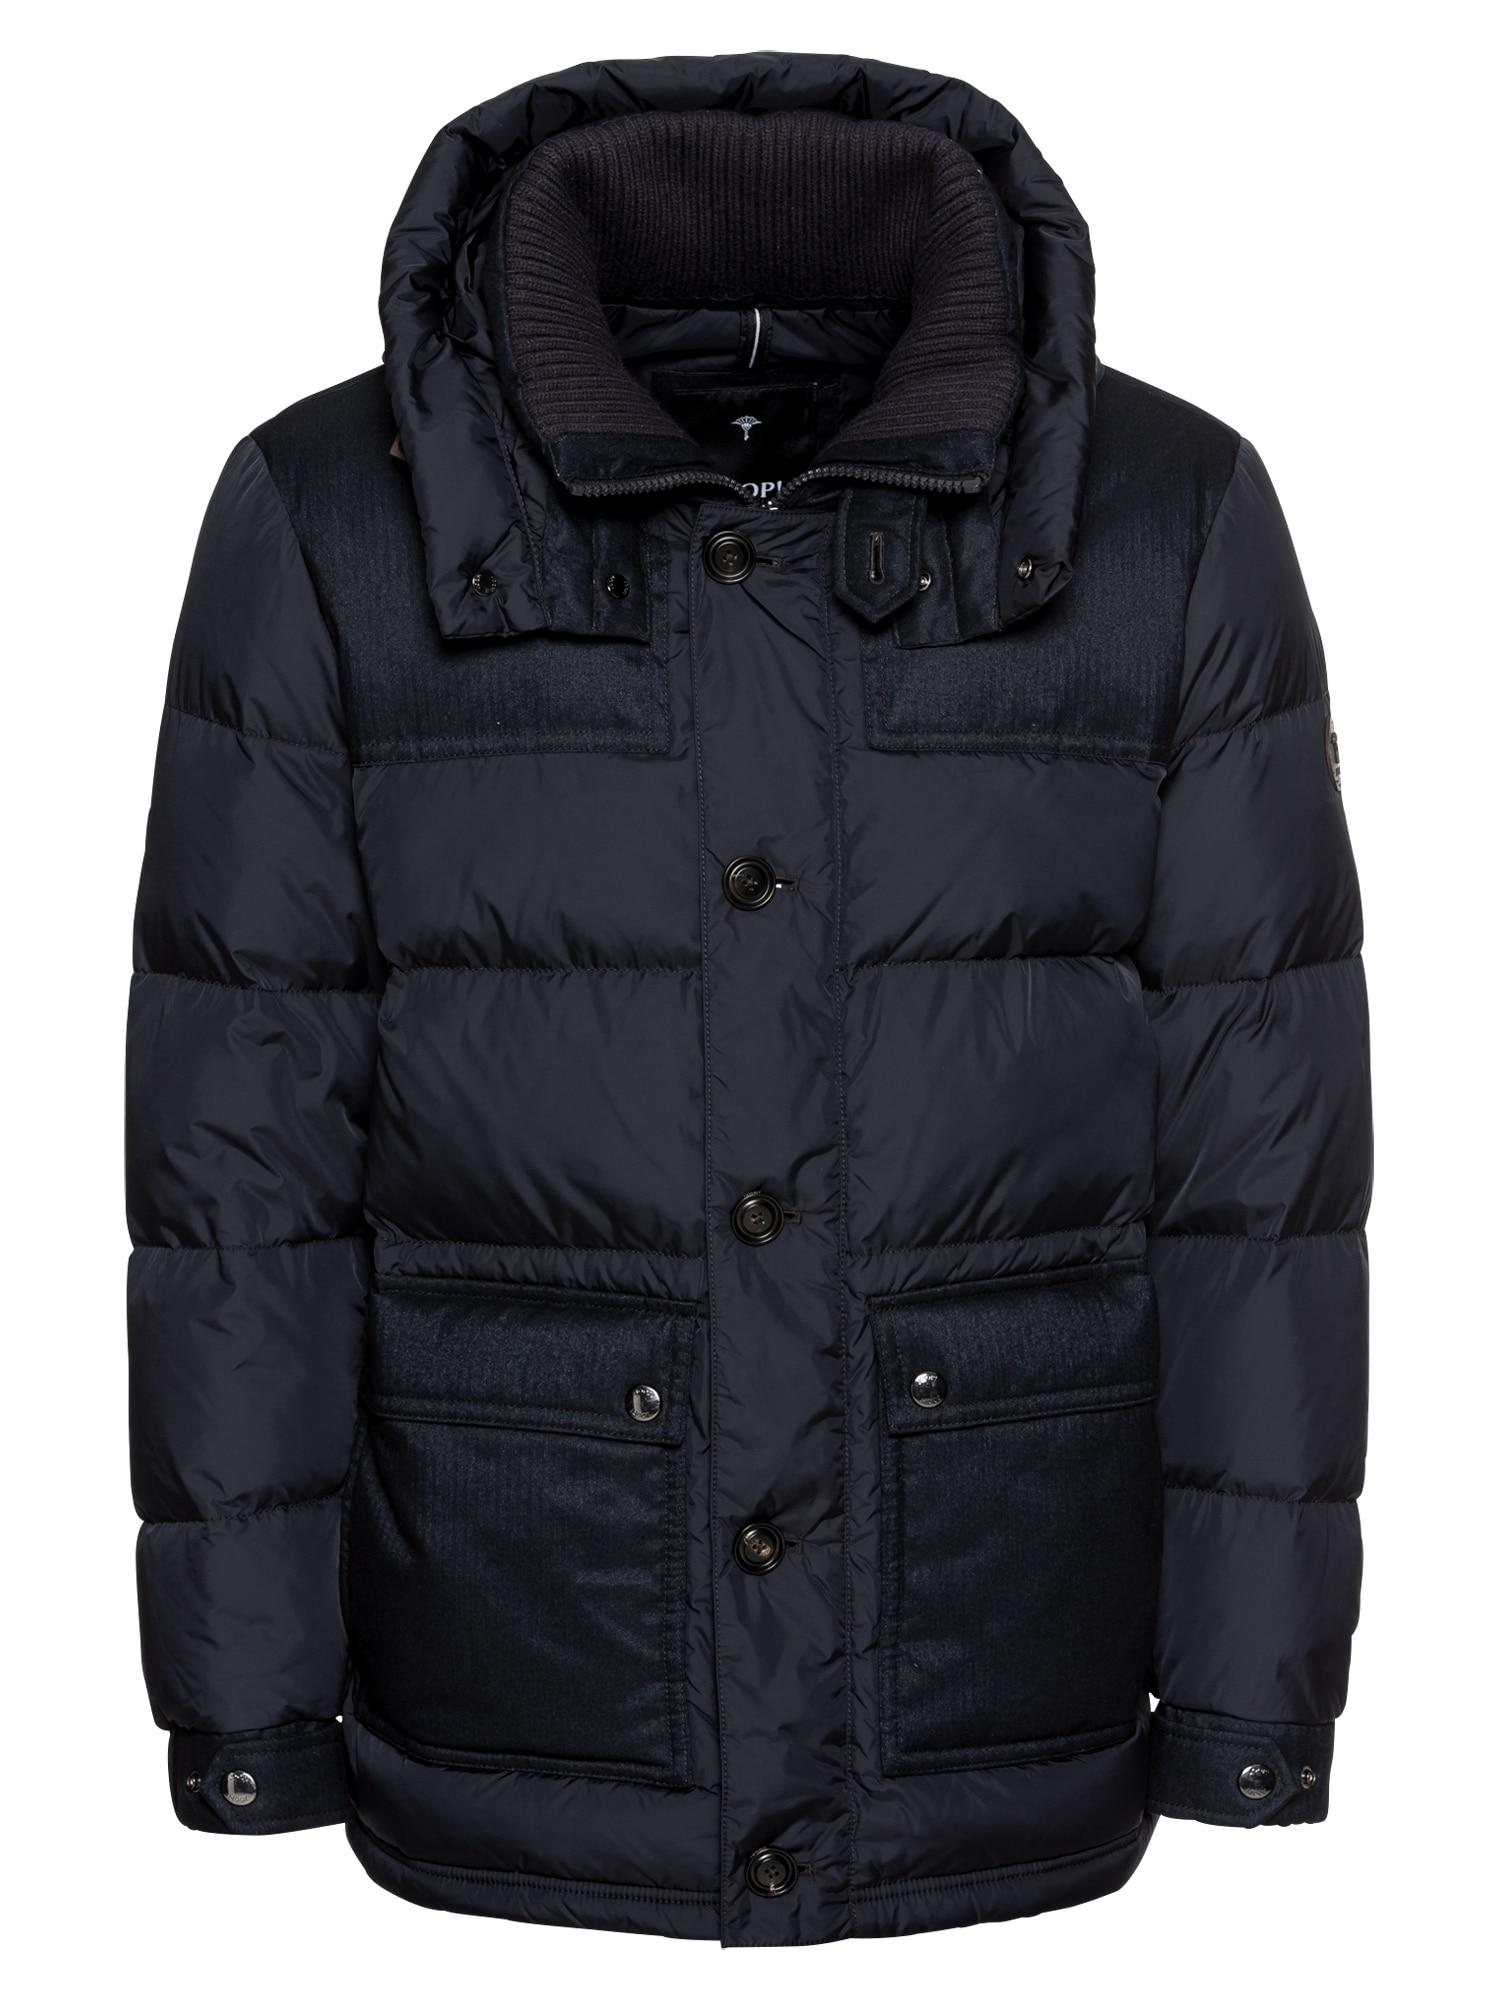 Zimní bunda WILSON tmavě modrá JOOP!